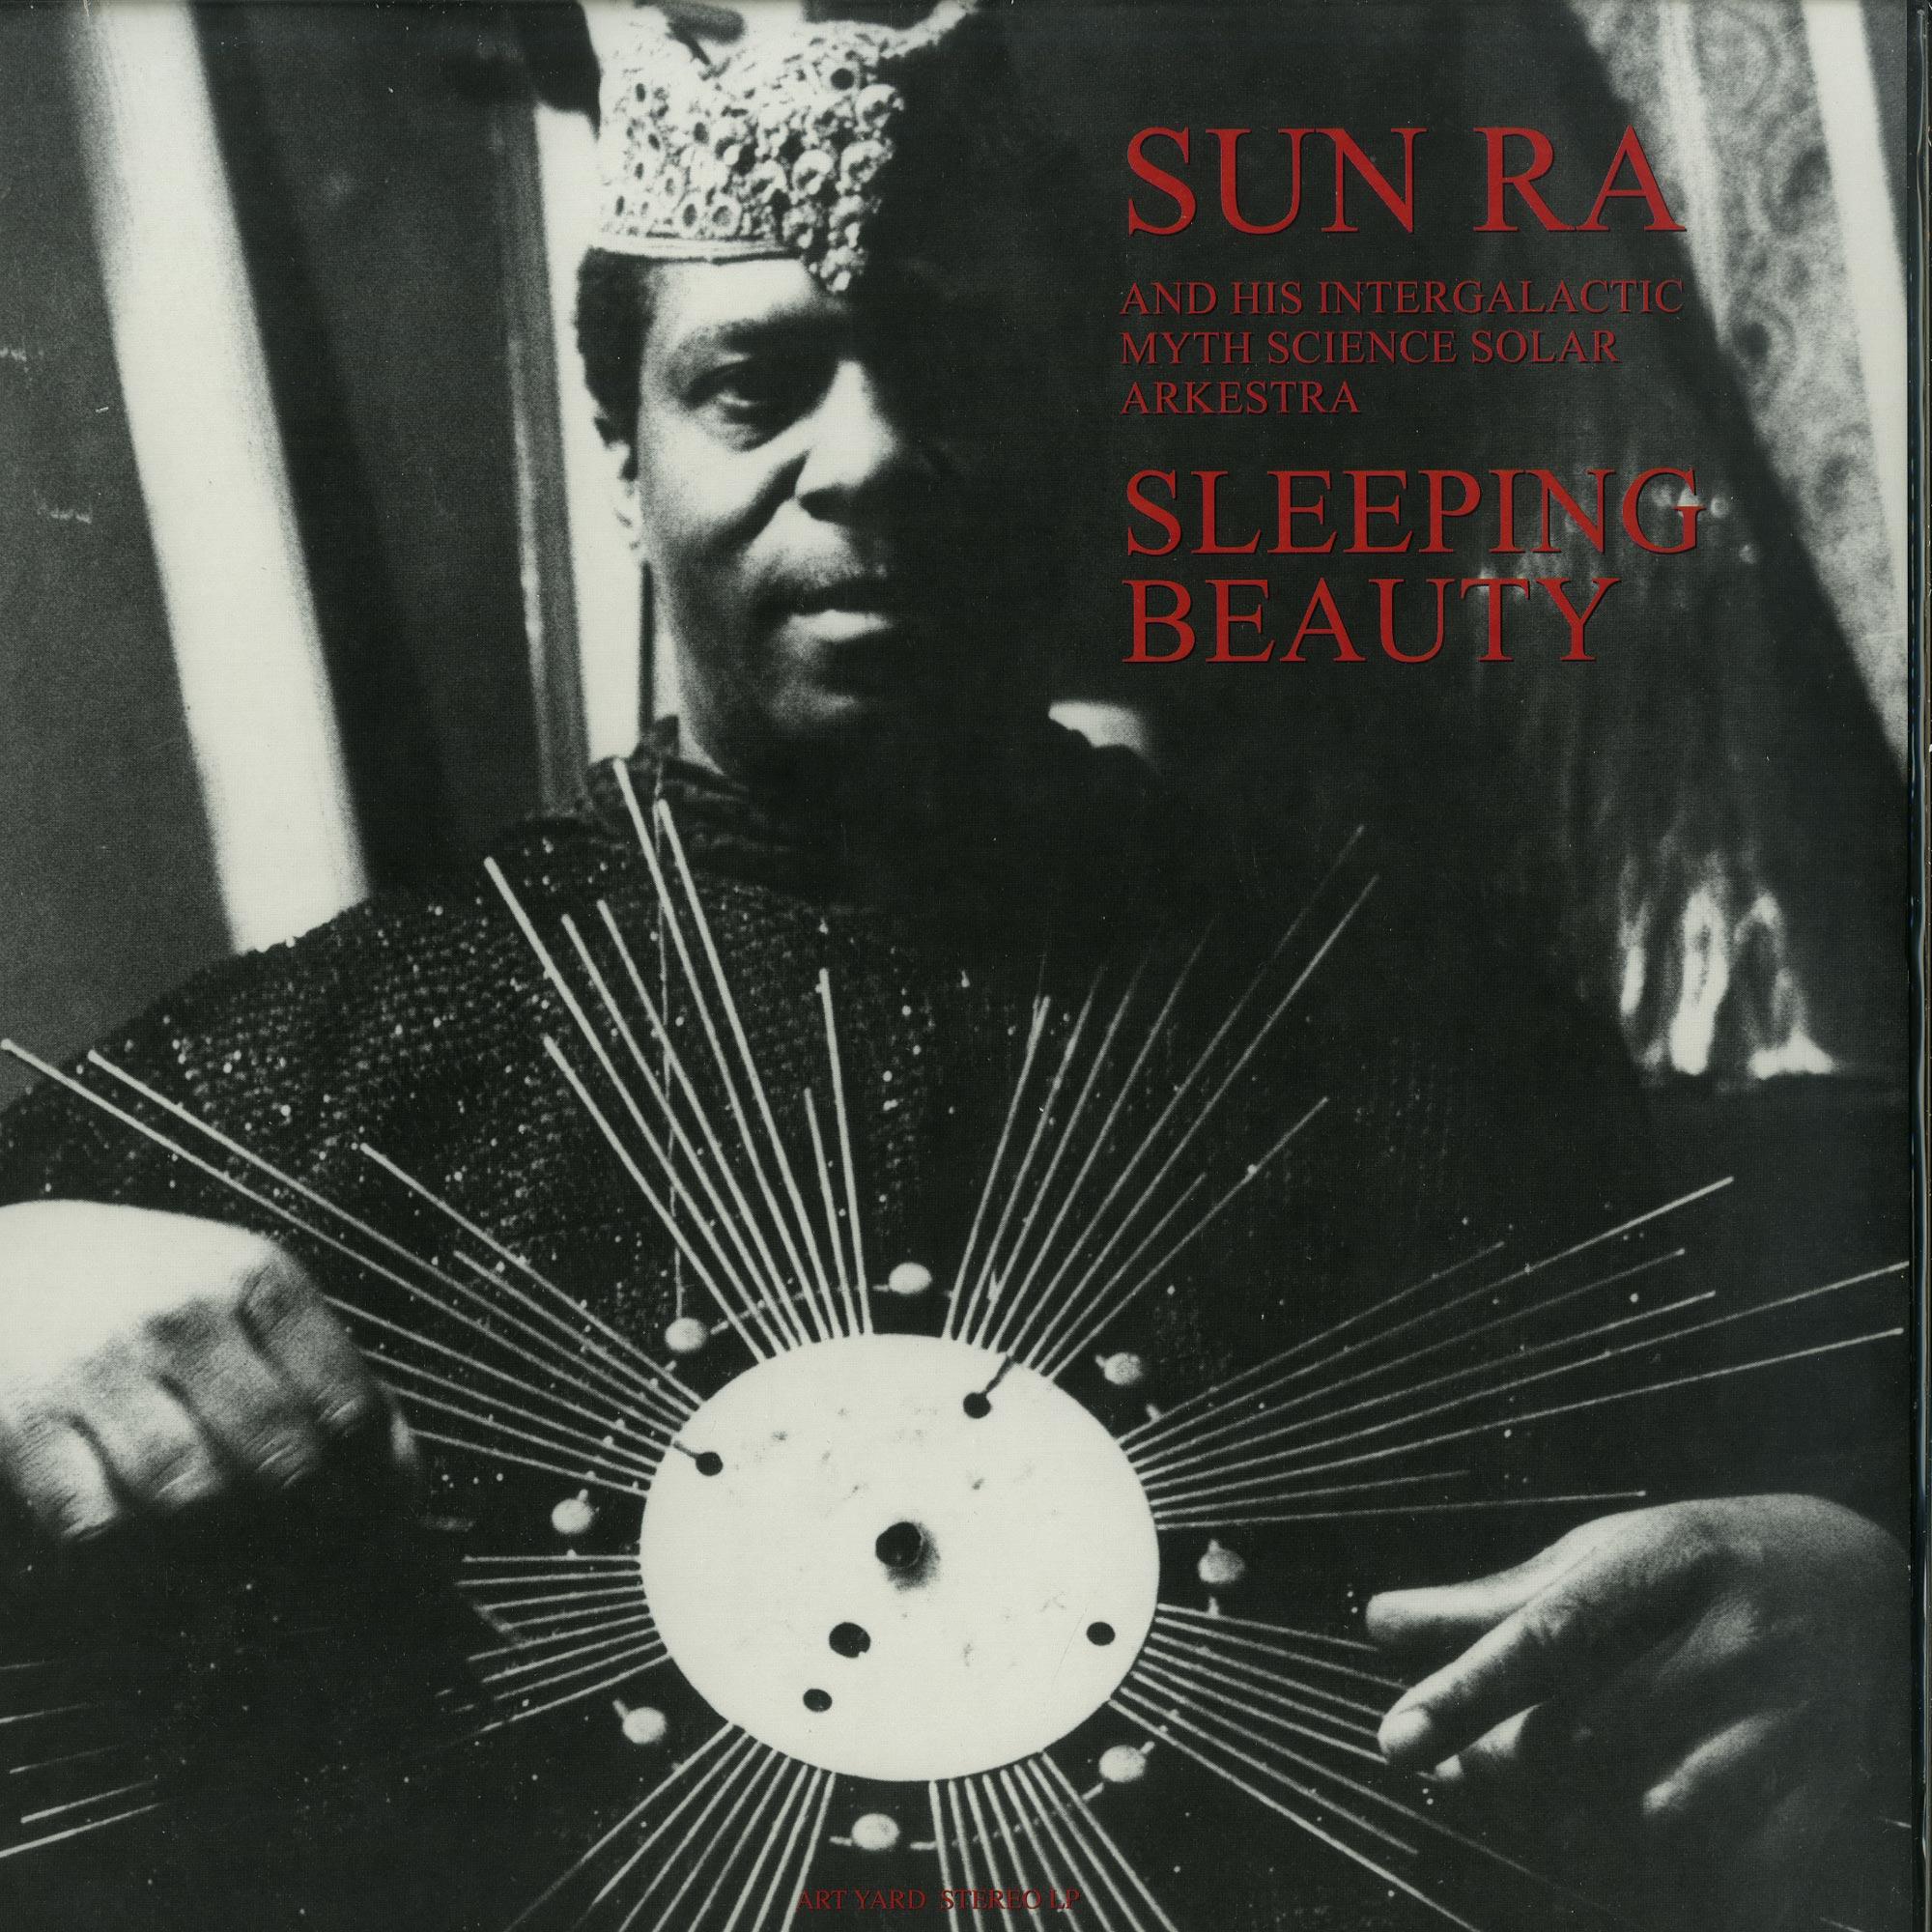 Sun Ra And His Myth Science Solar Arkestra - SLEEPING BEAUTY